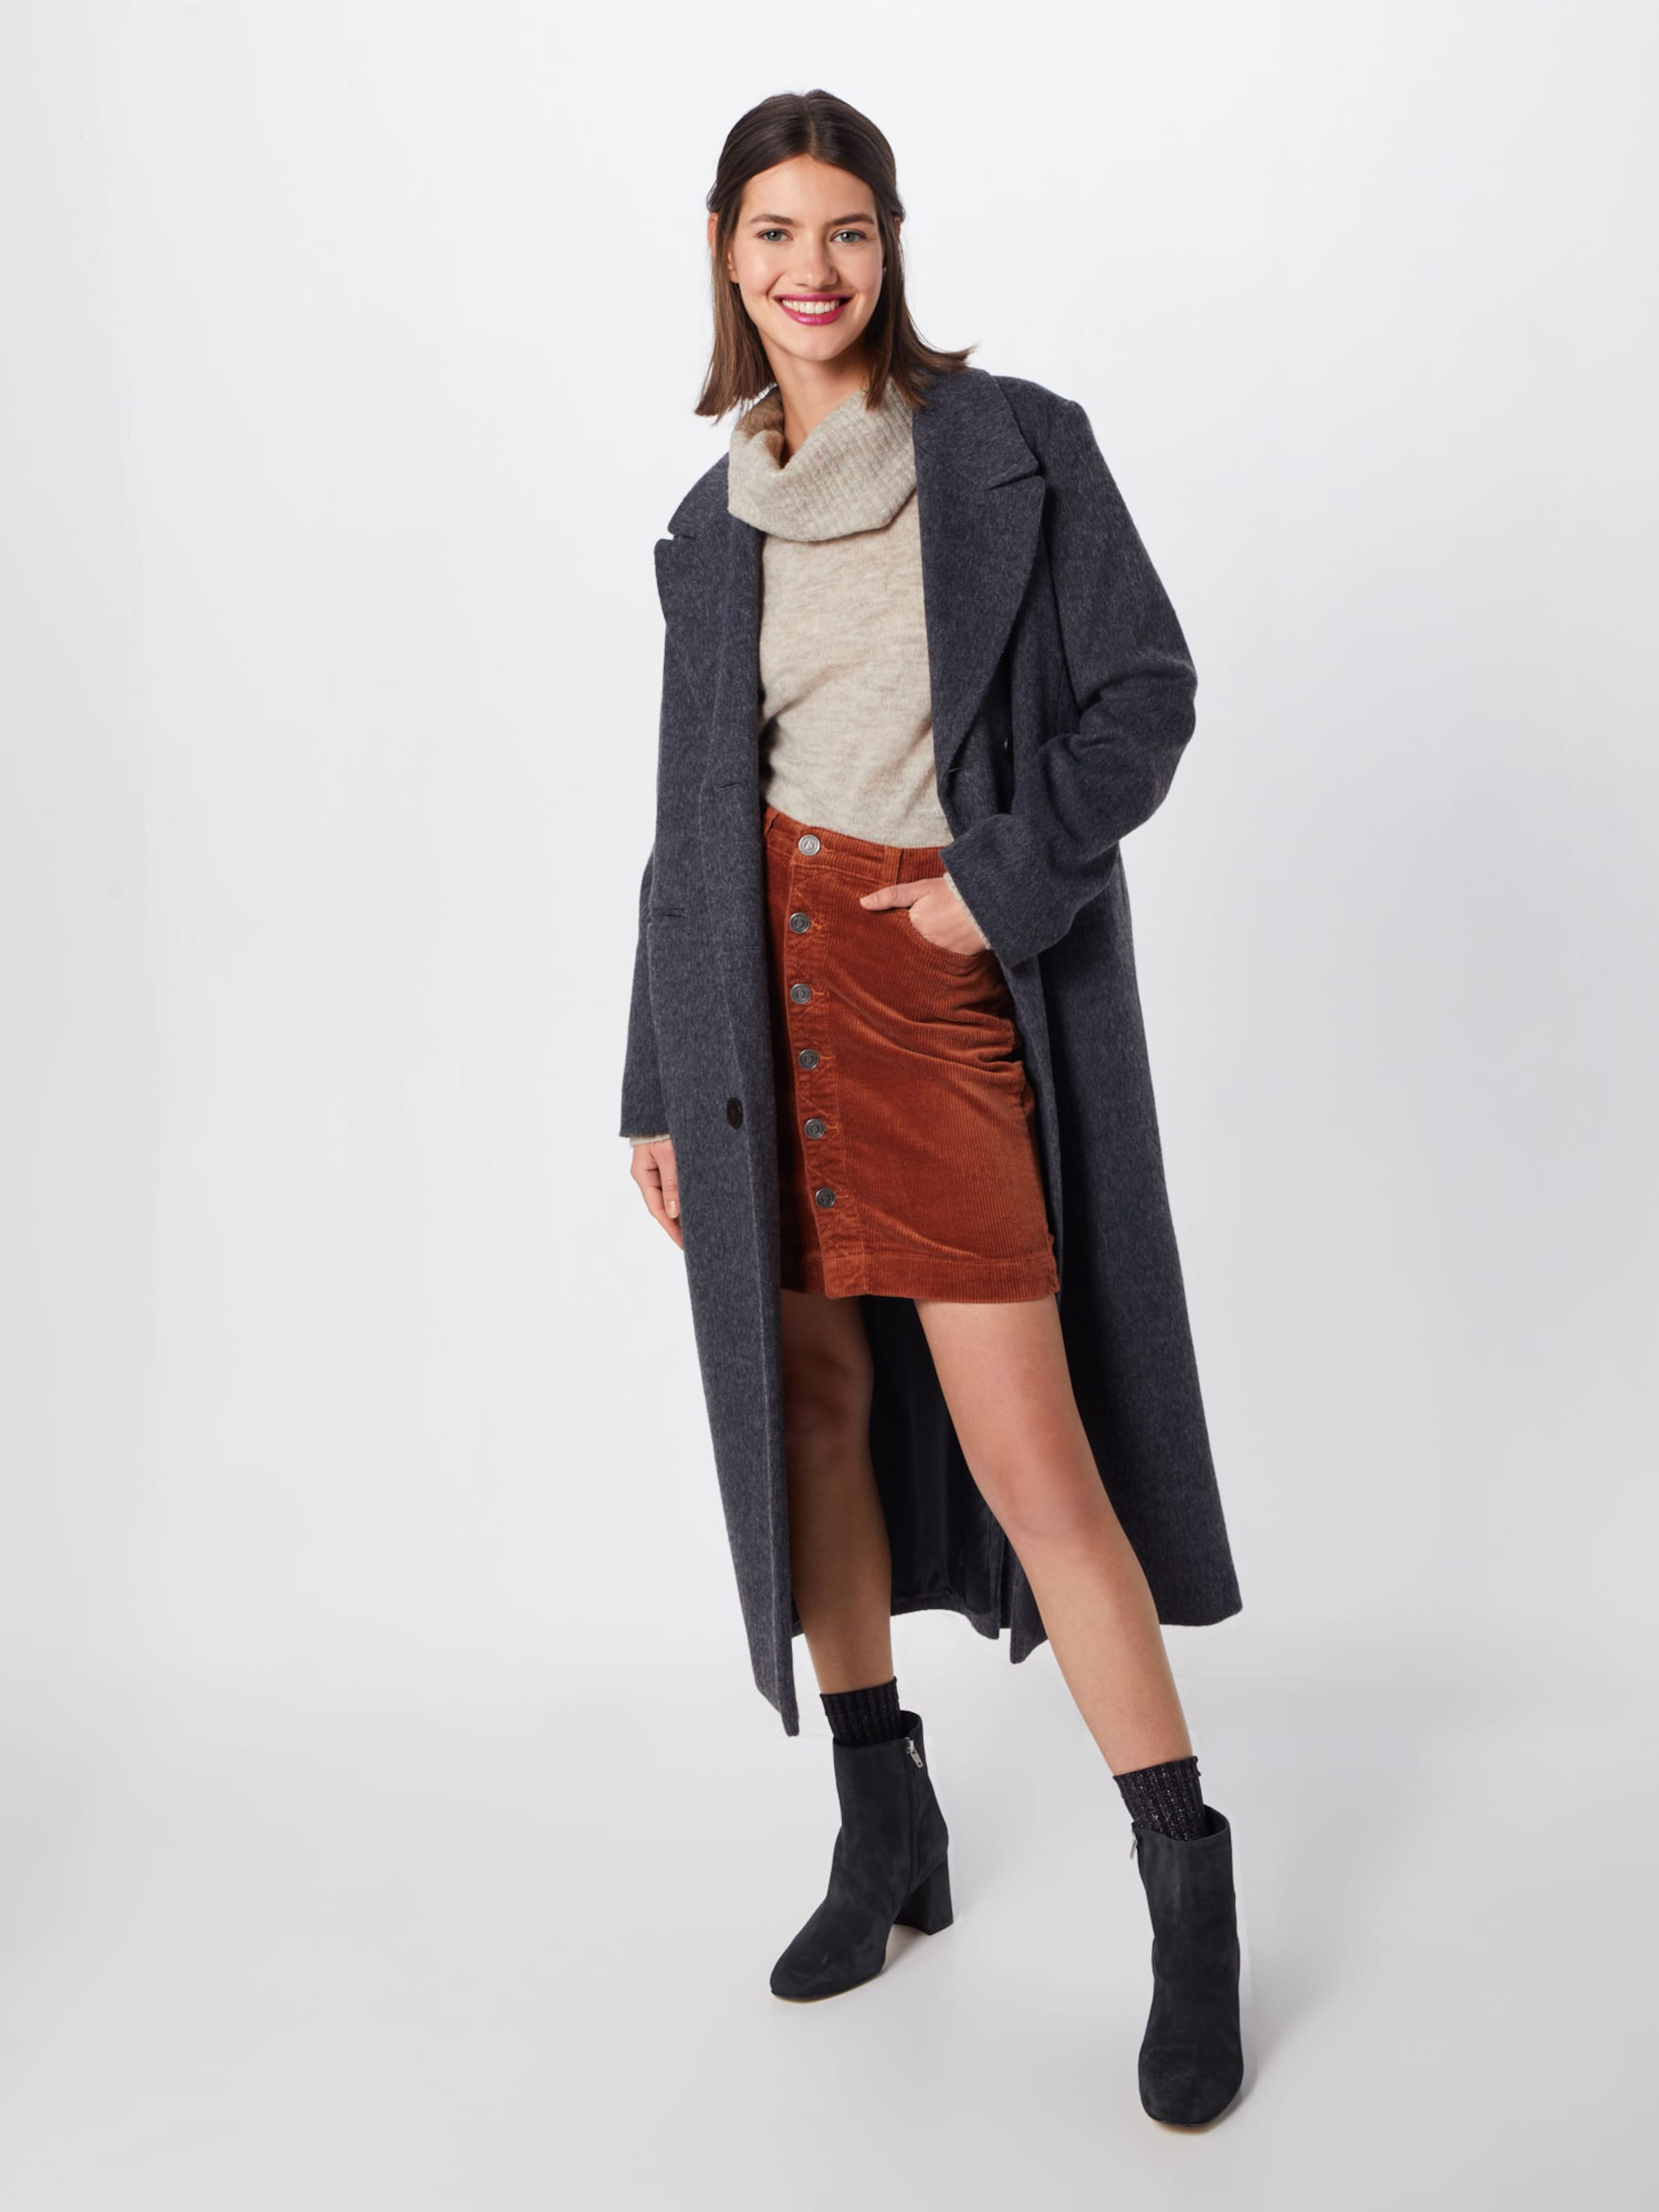 Beige Turtleneck' In 'kaitlyn Pullover Cream 80wPnOk